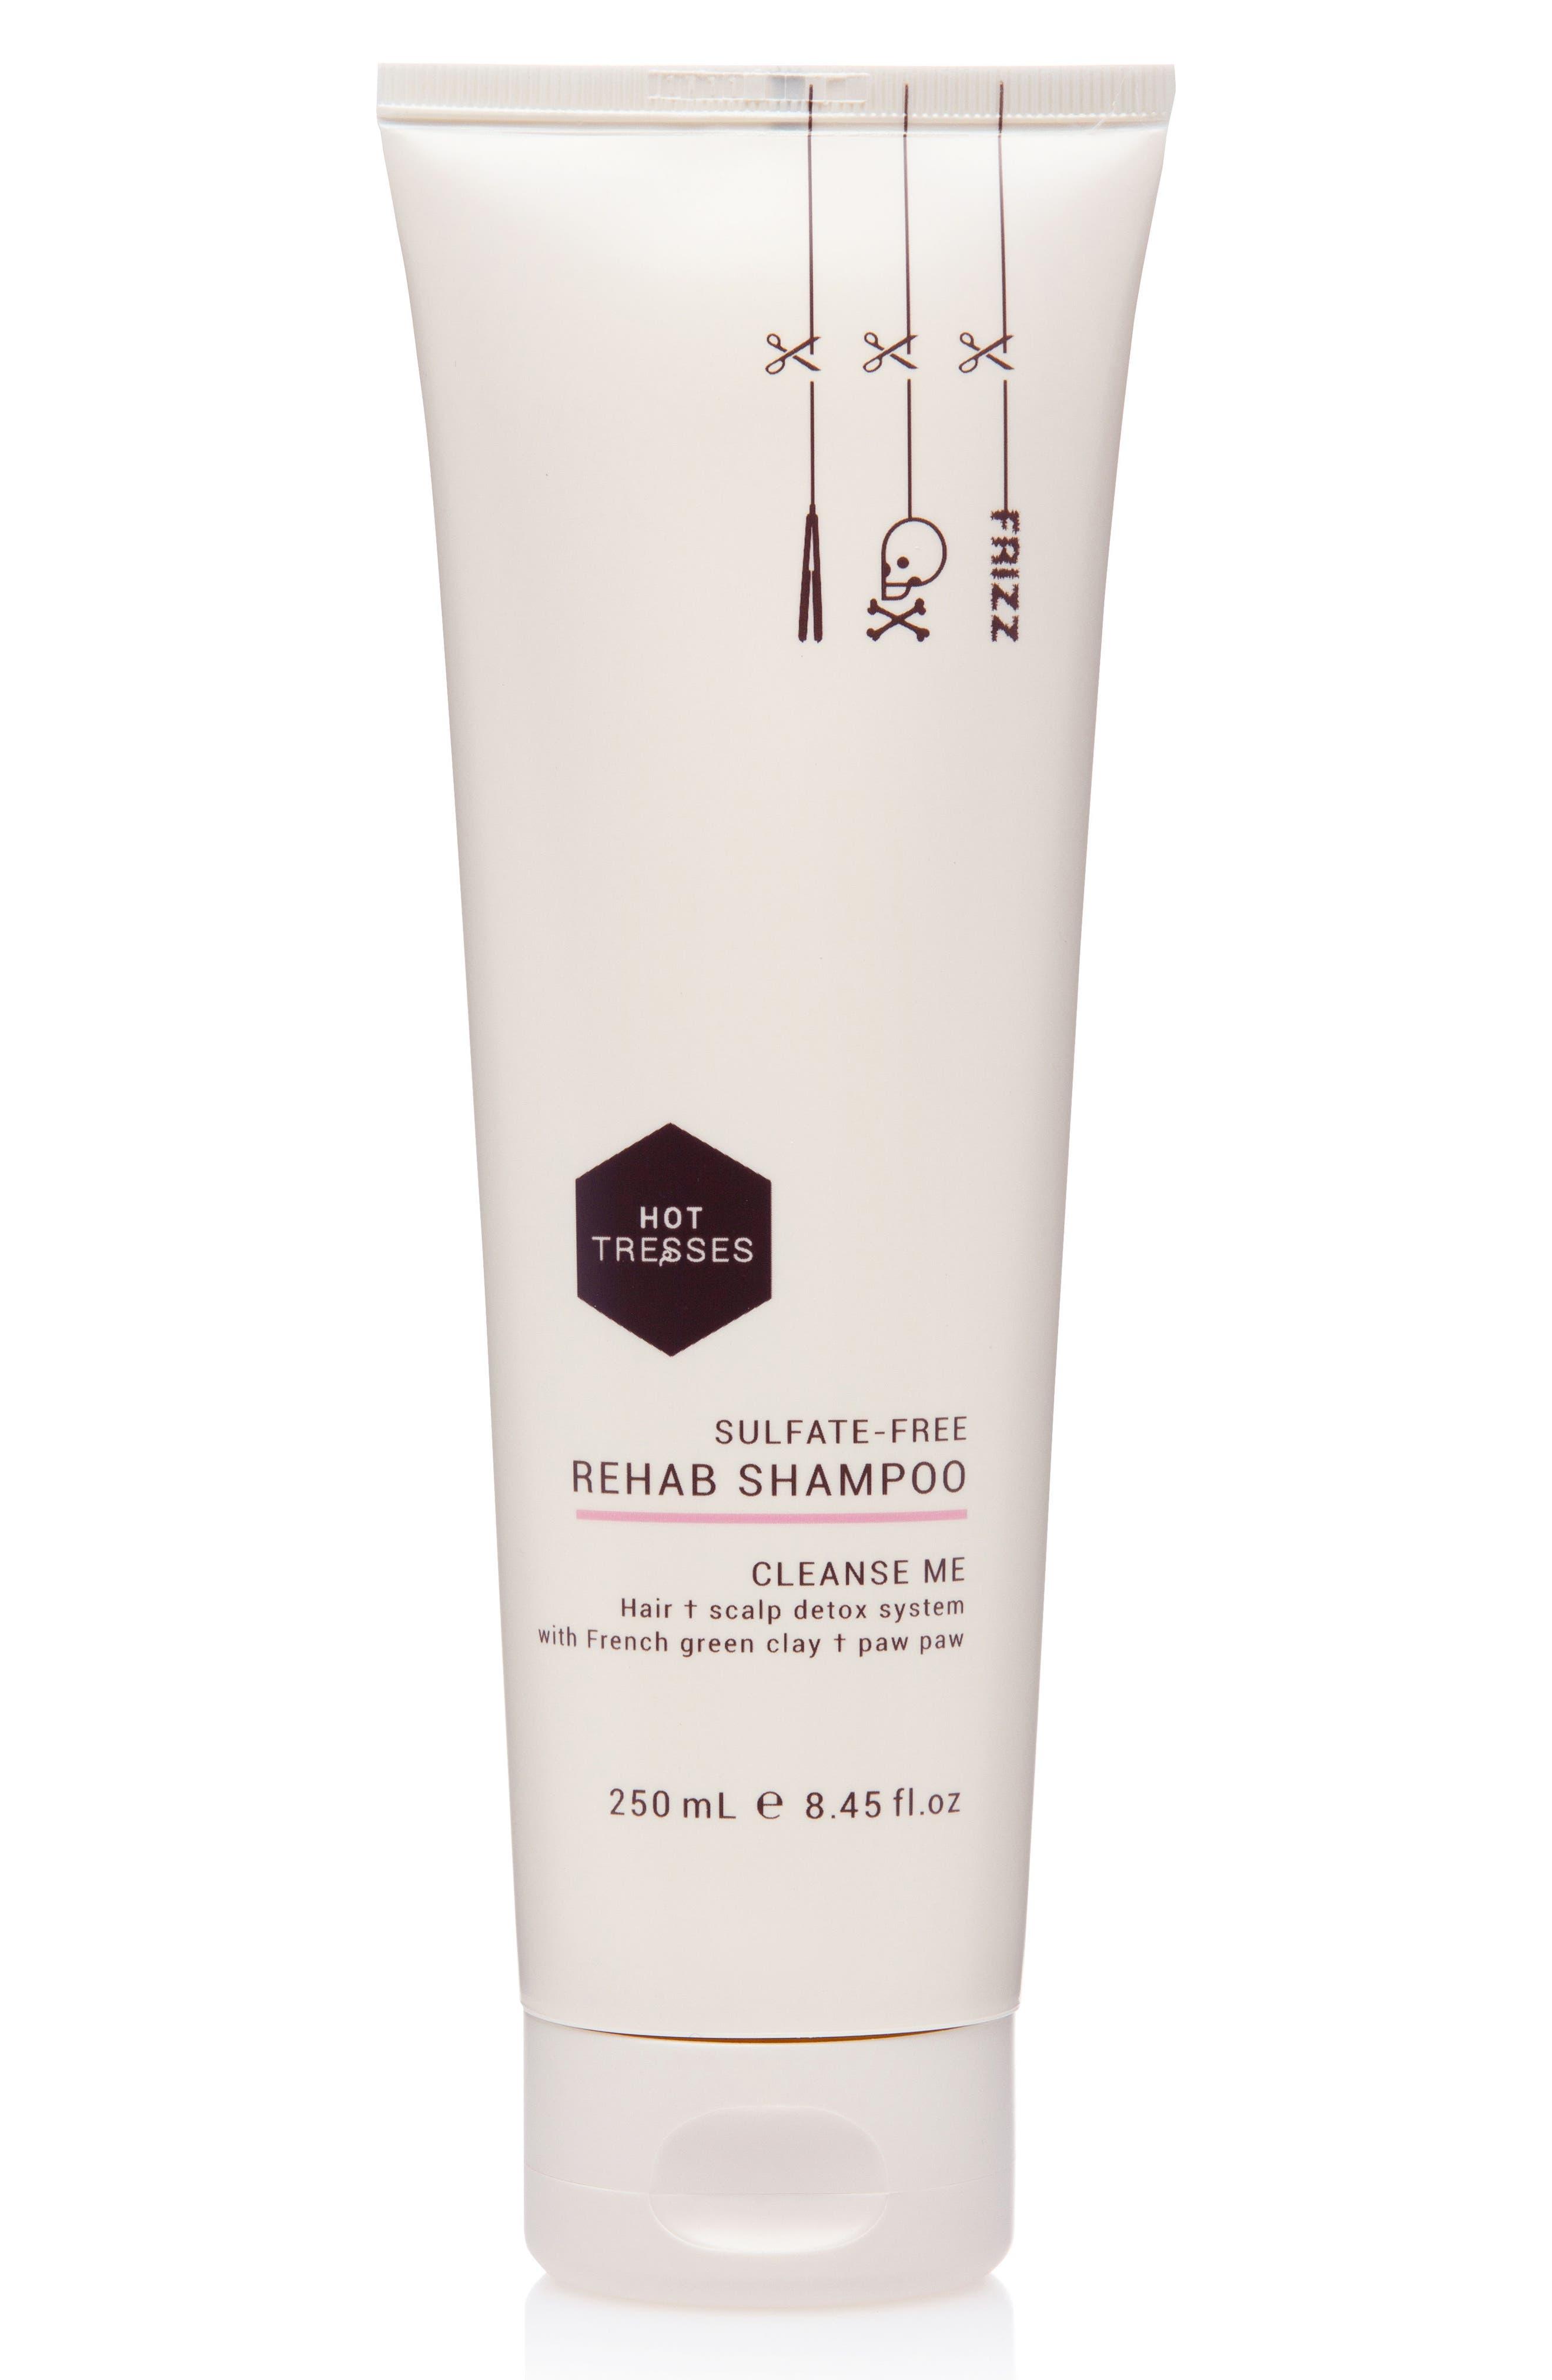 Hot Tresses Sulfate-Free Rehab Shampoo